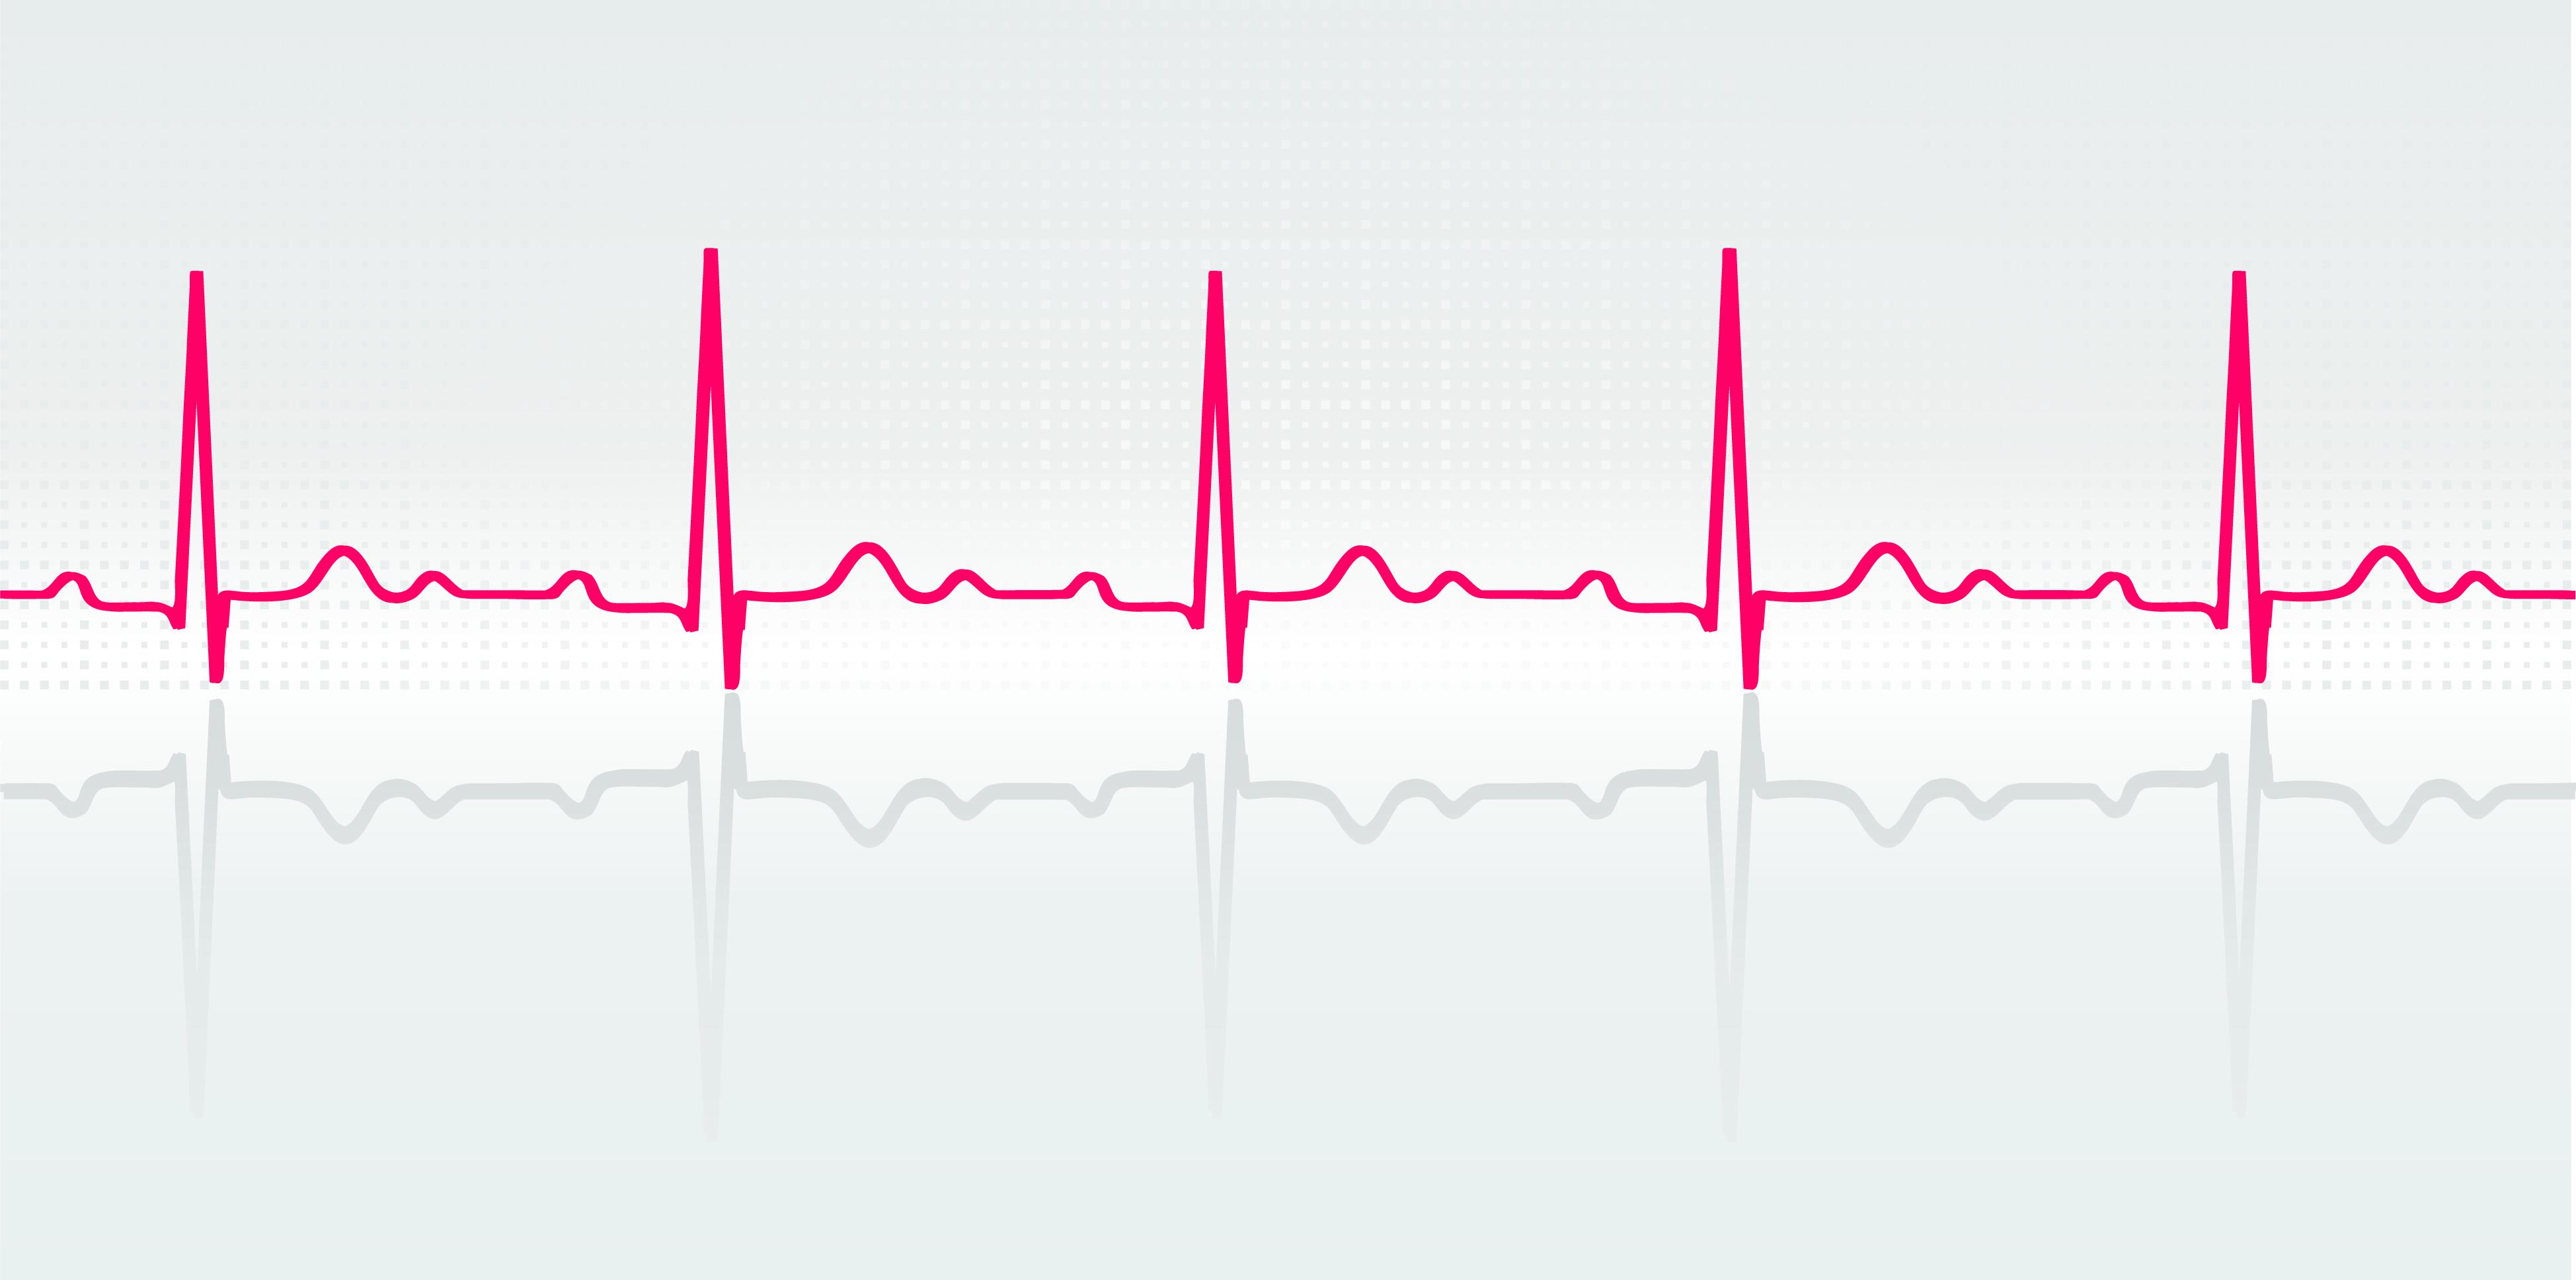 Vector illustration of normal human electrocardiogram. Credit: Shutterstock